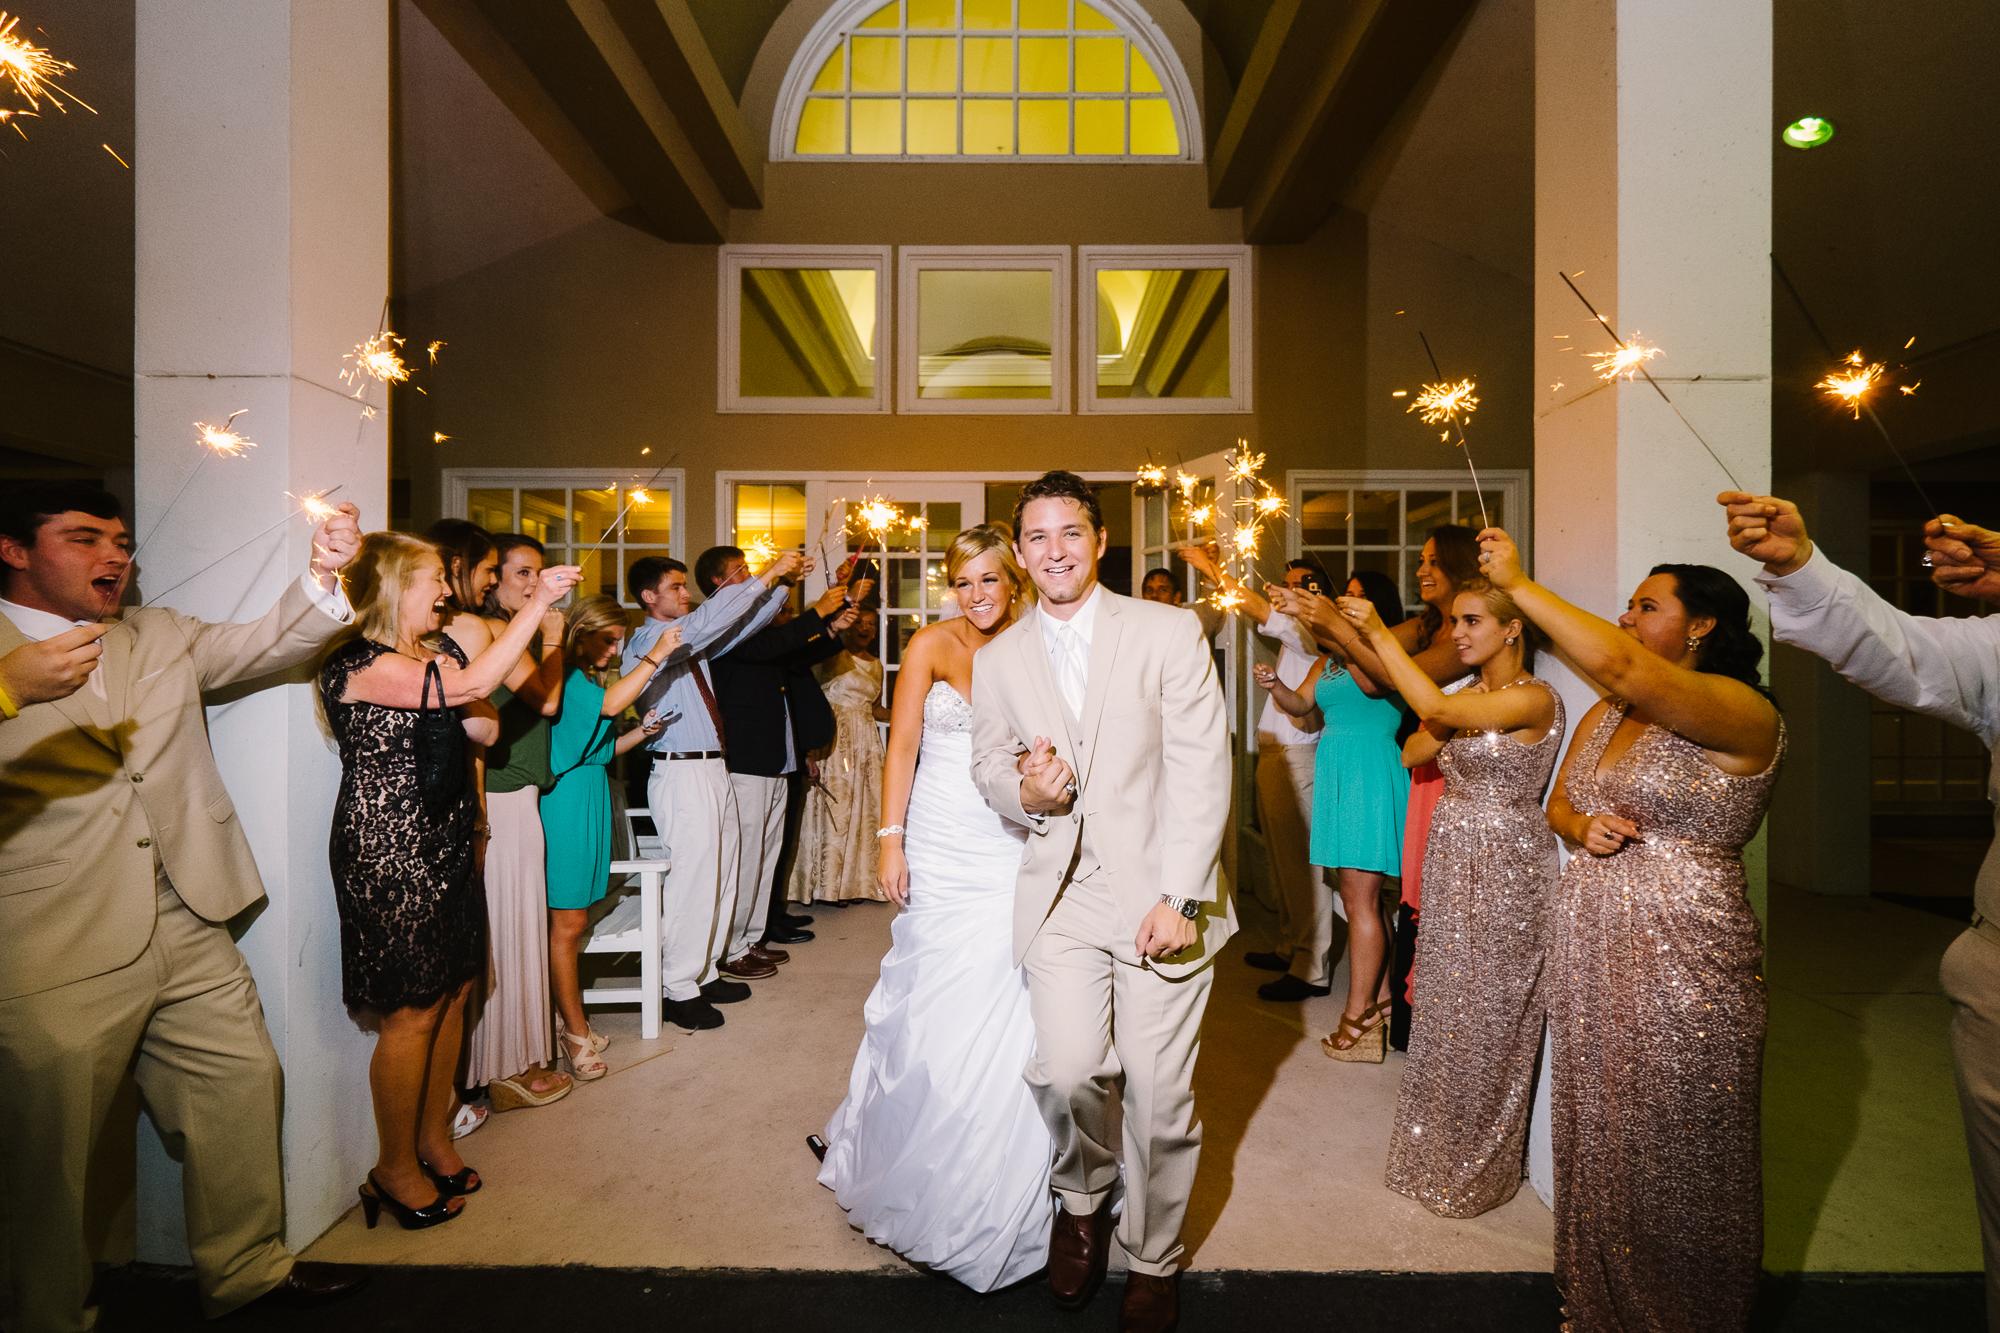 Heather-Chris-wedding-blog-43.jpg